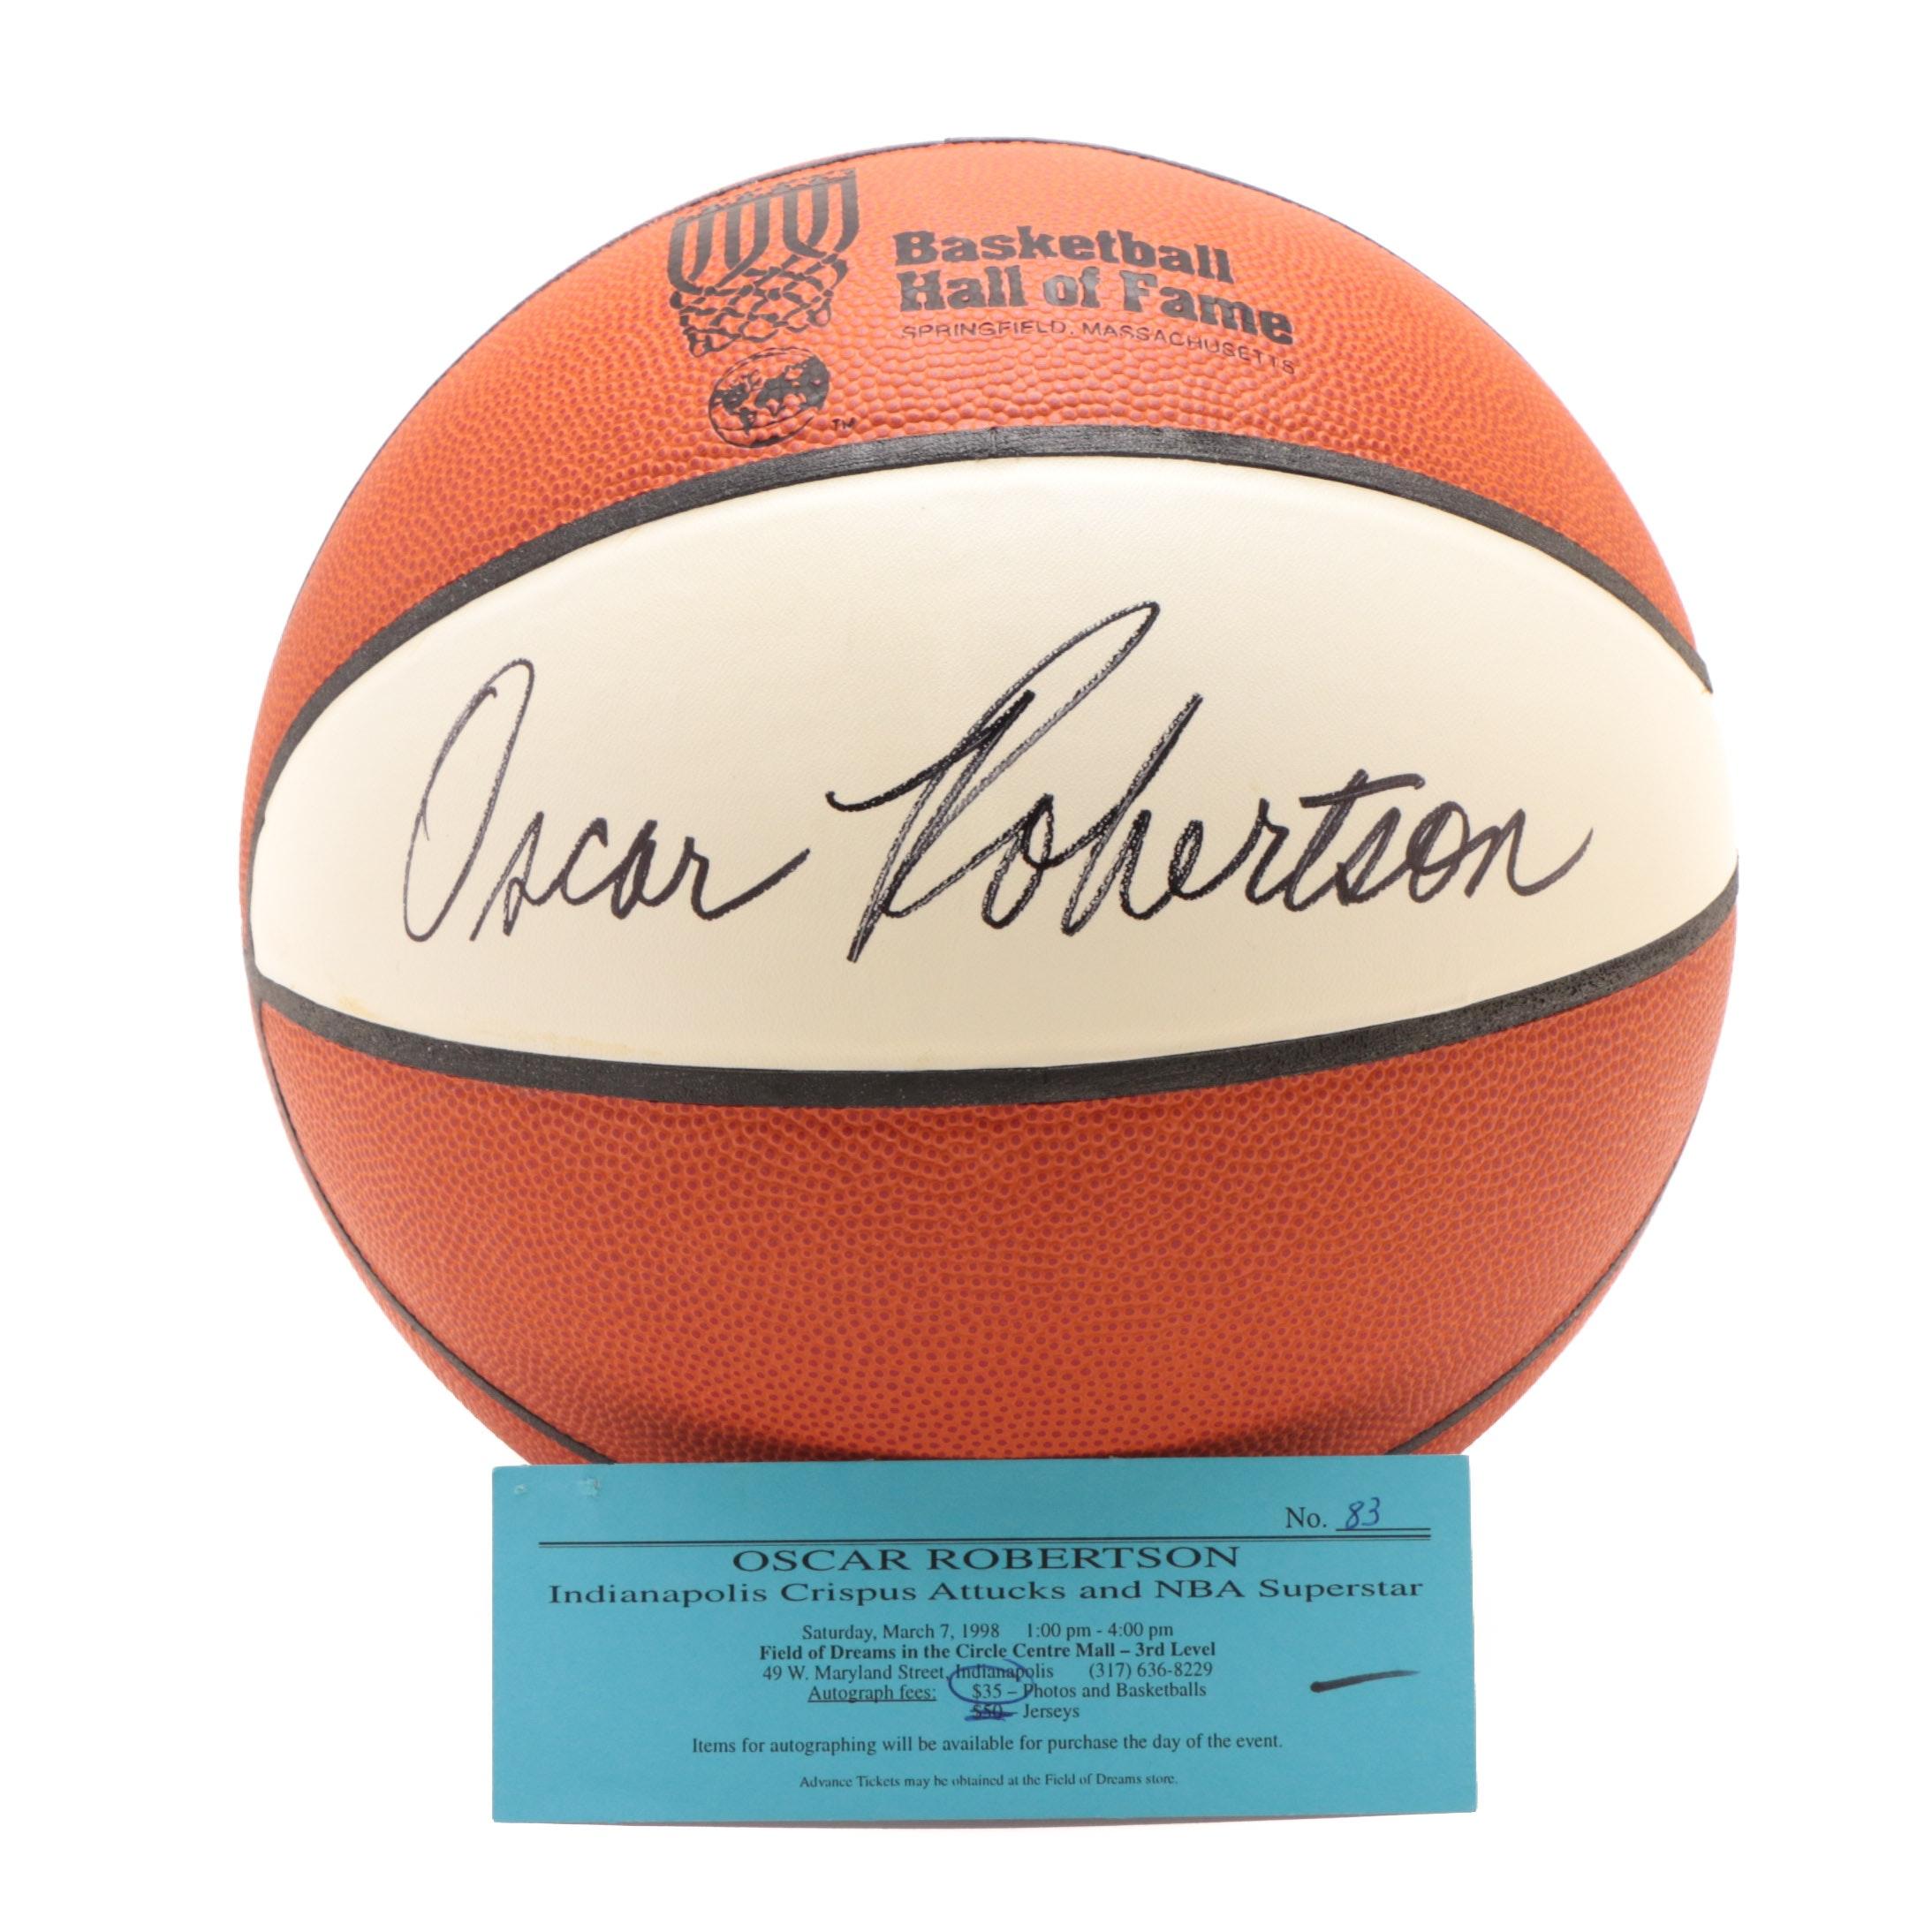 Oscar Robertson Signed Basketball  COA